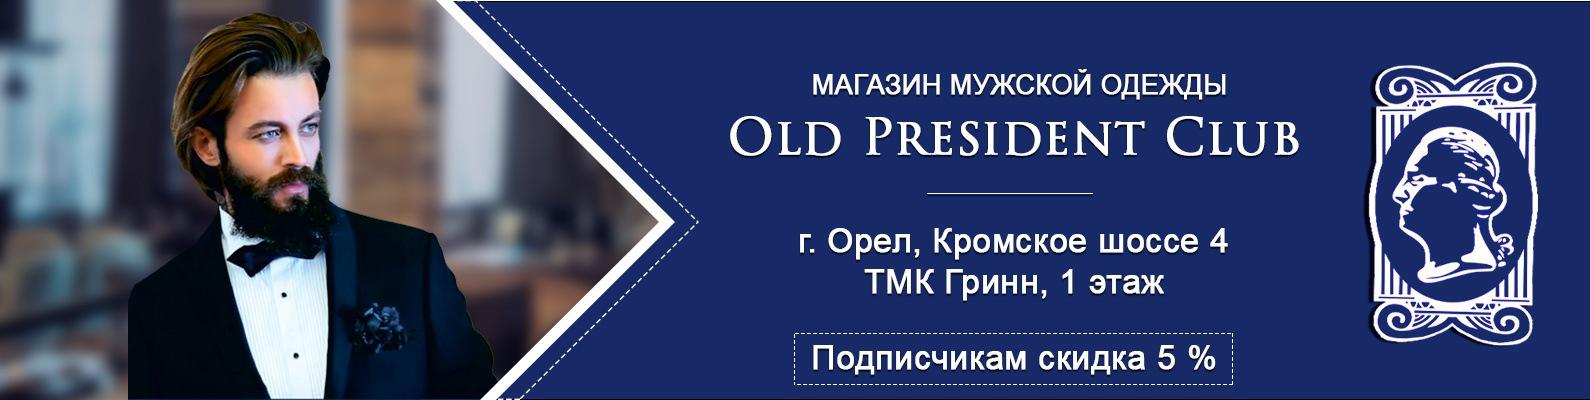 e9d66b48e9a Магазин мужской одежды Old President Club г.Орел